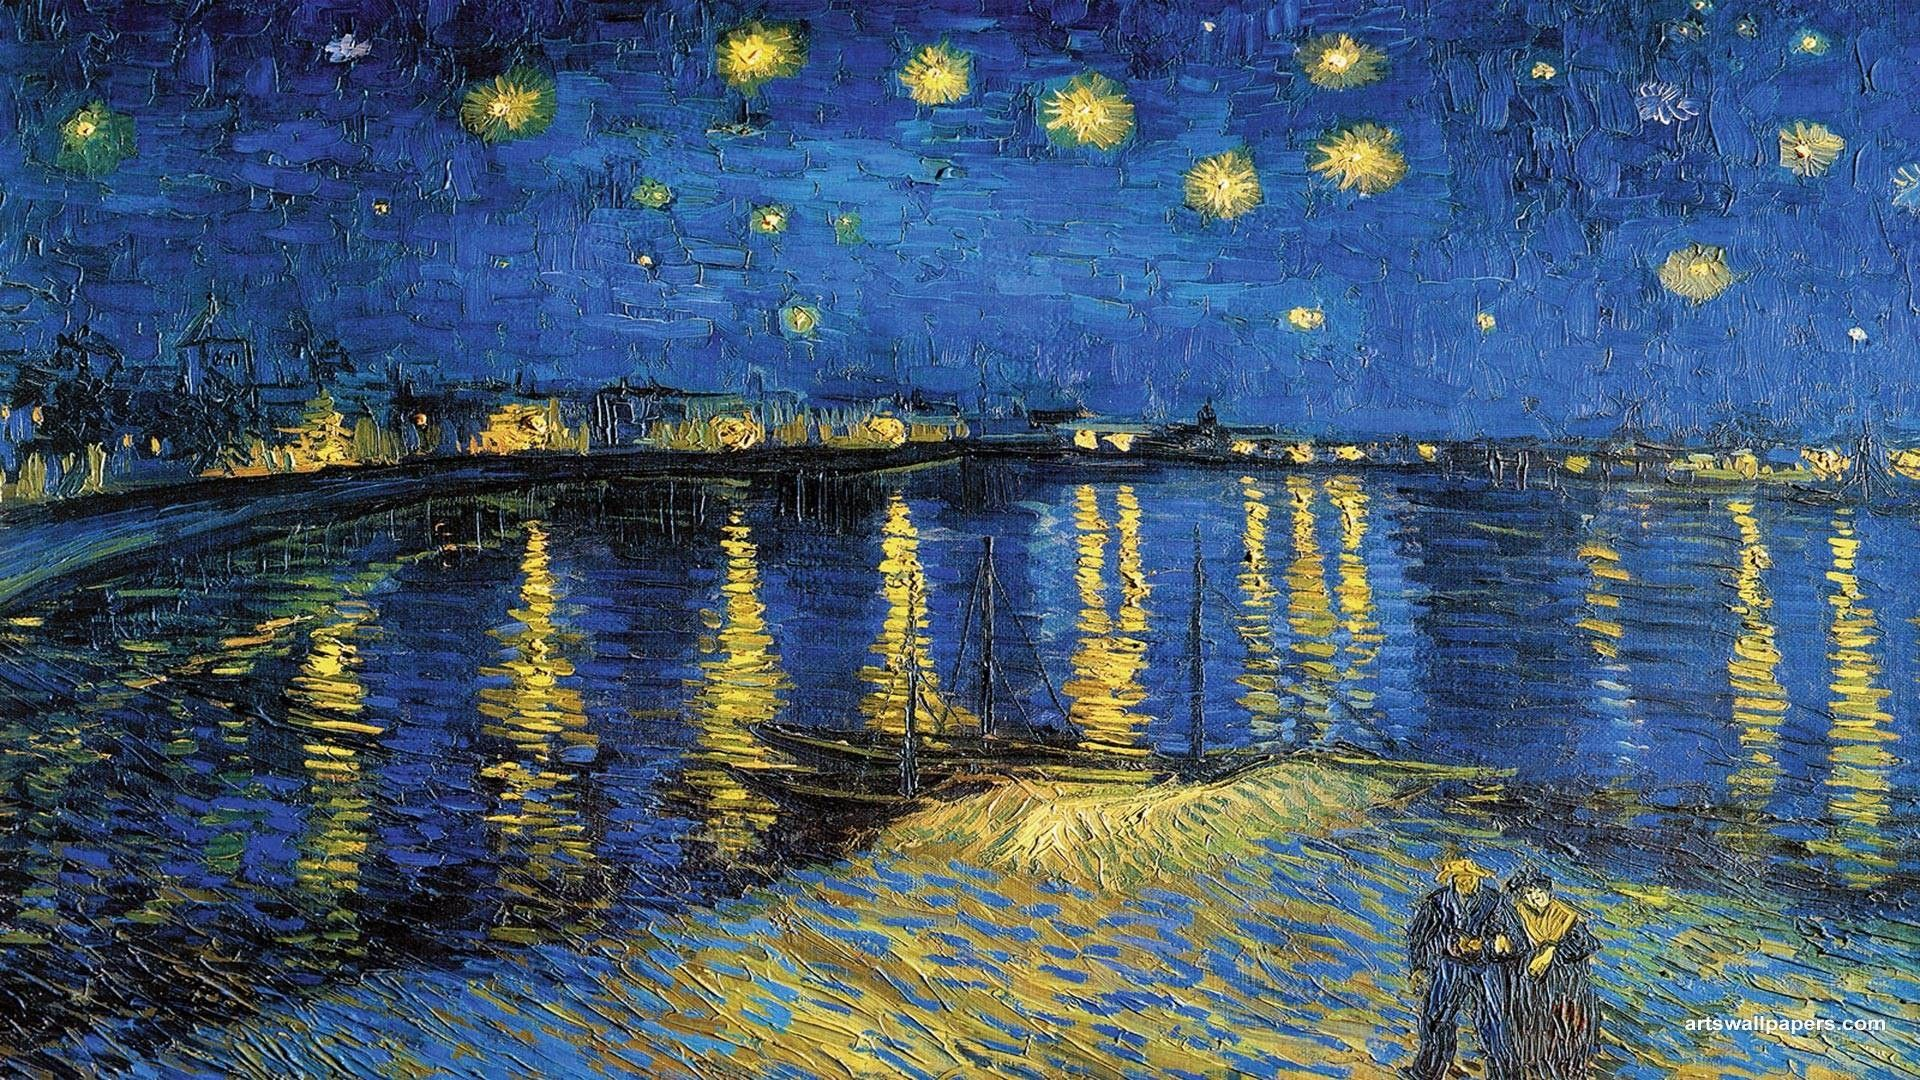 Wallpapers Starry Night Vincent Van Gogh Over The Rhone Wallpaper 1920x1080 Starry Night Van Gogh Van Gogh Wallpaper Van Gogh Paintings